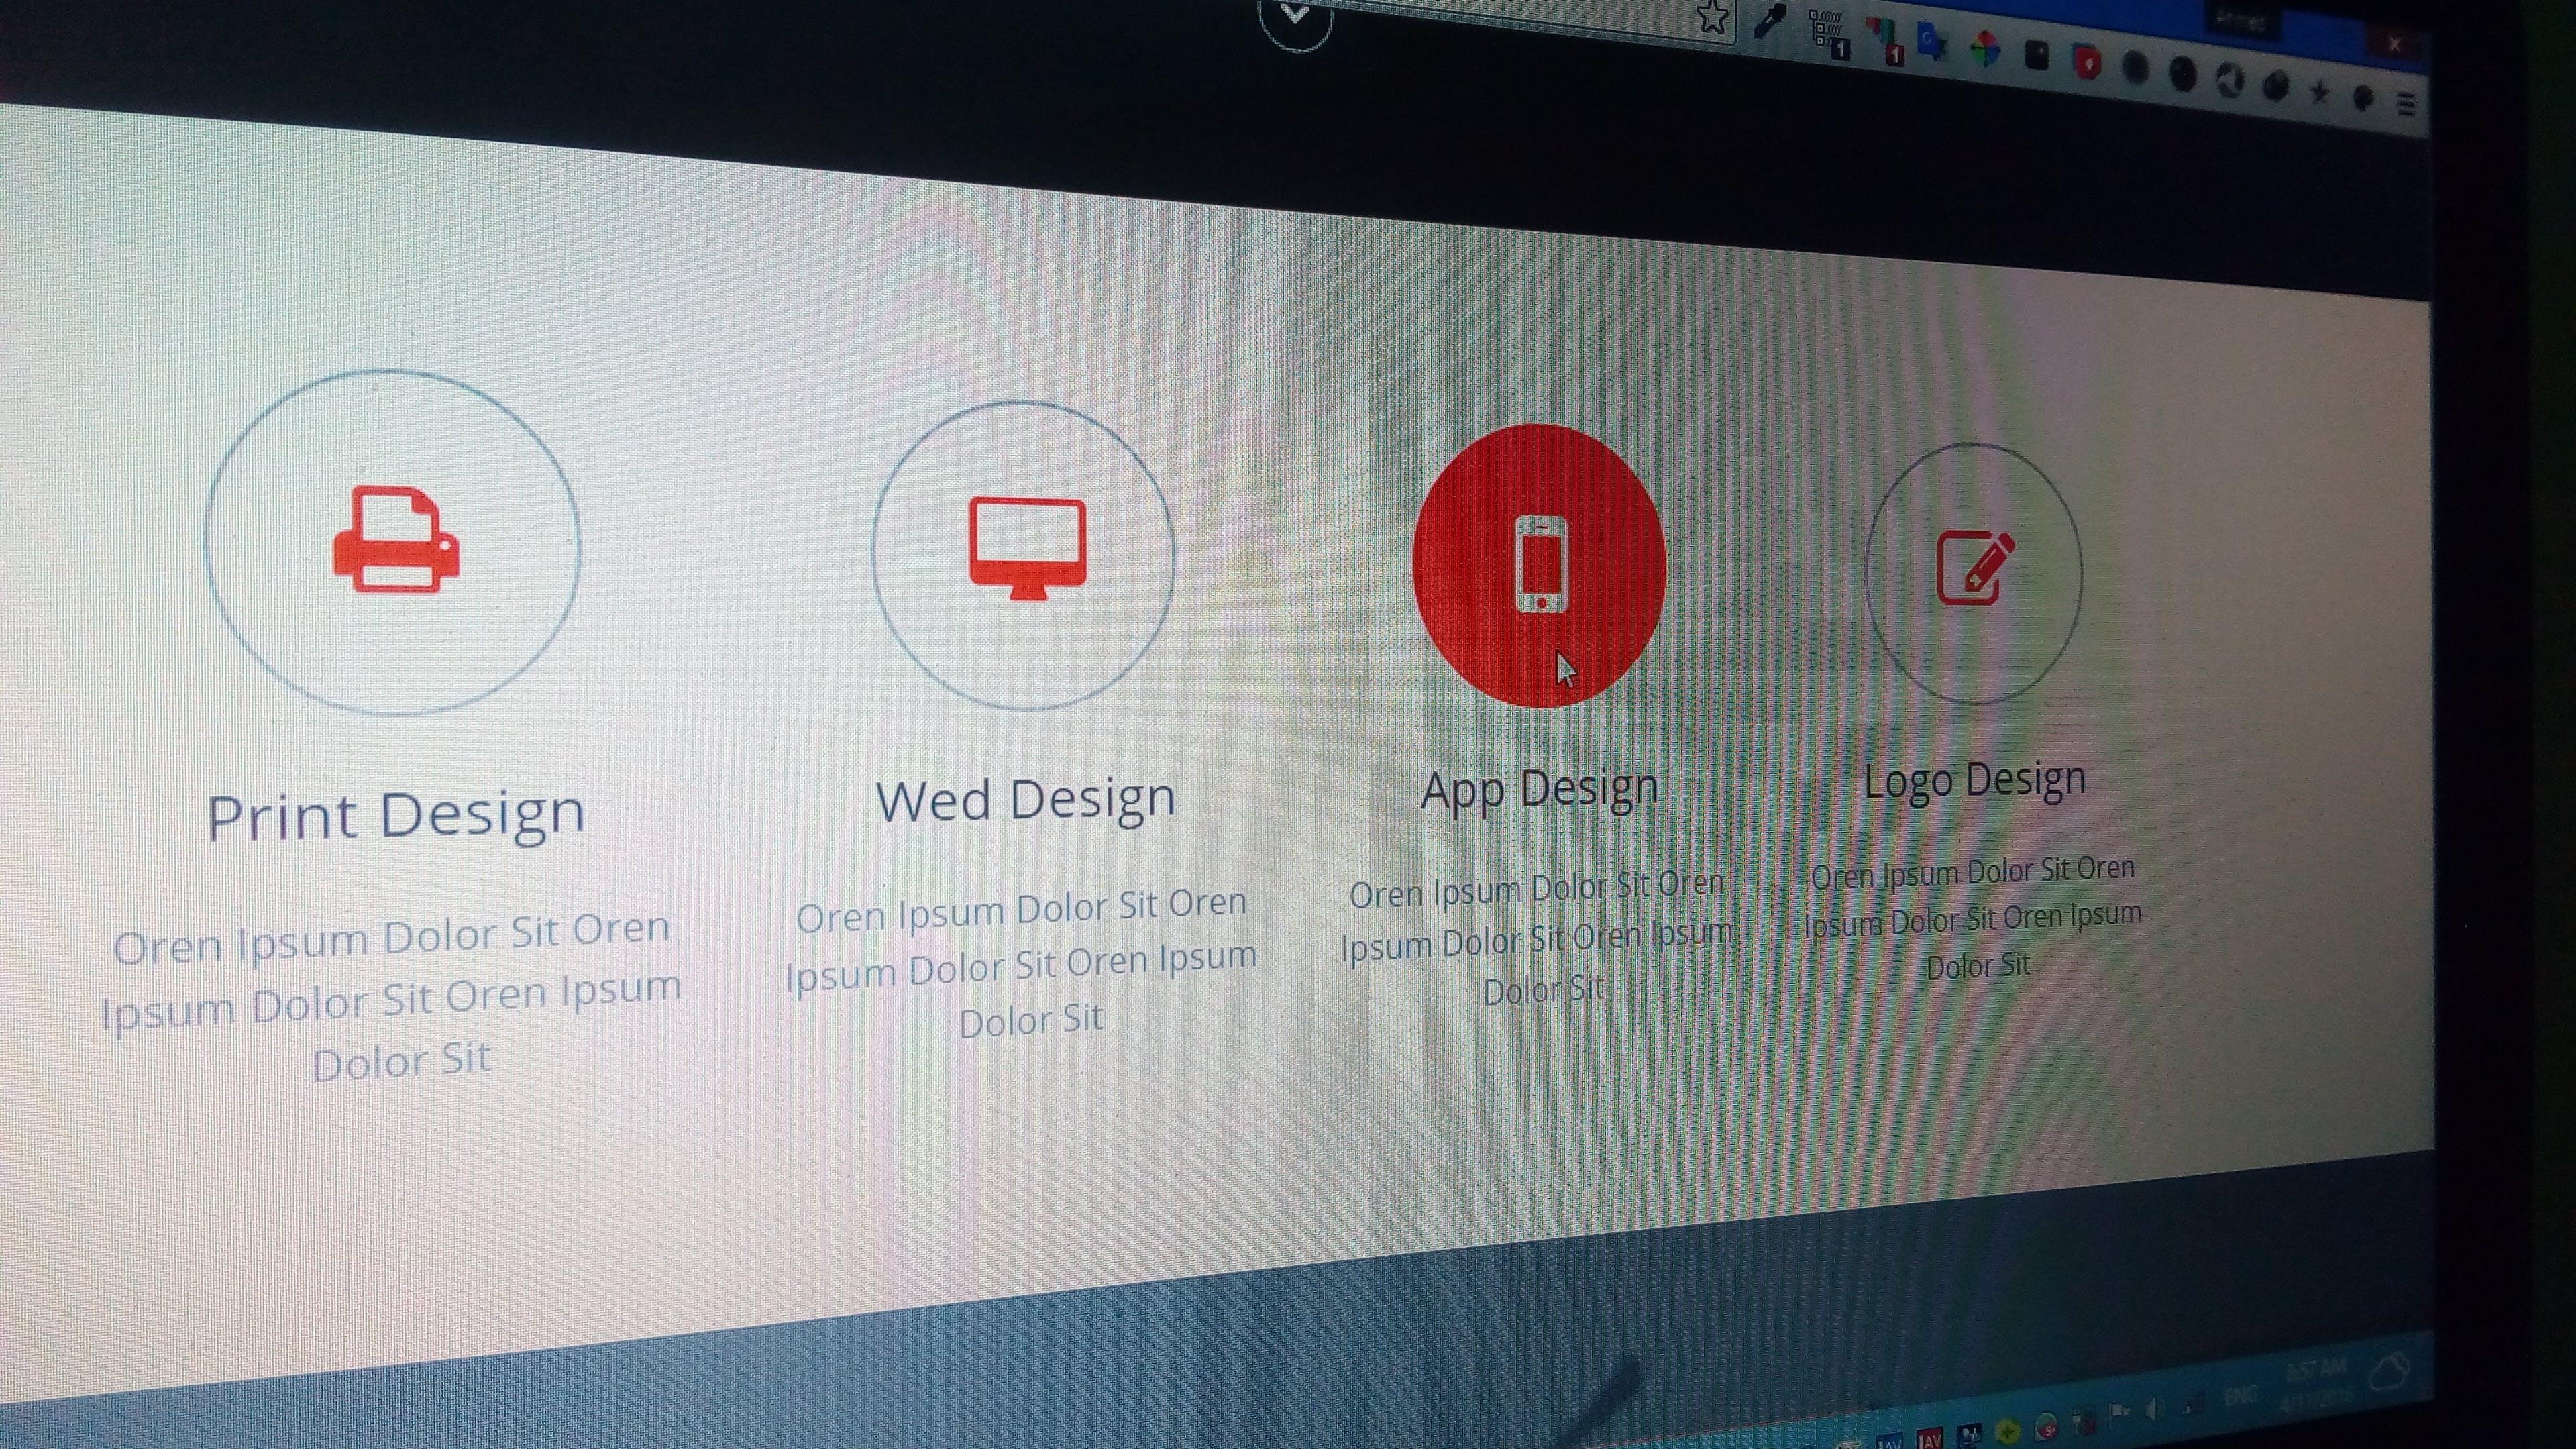 Free stock photo of App Design, code, coders, fingerprint scanner